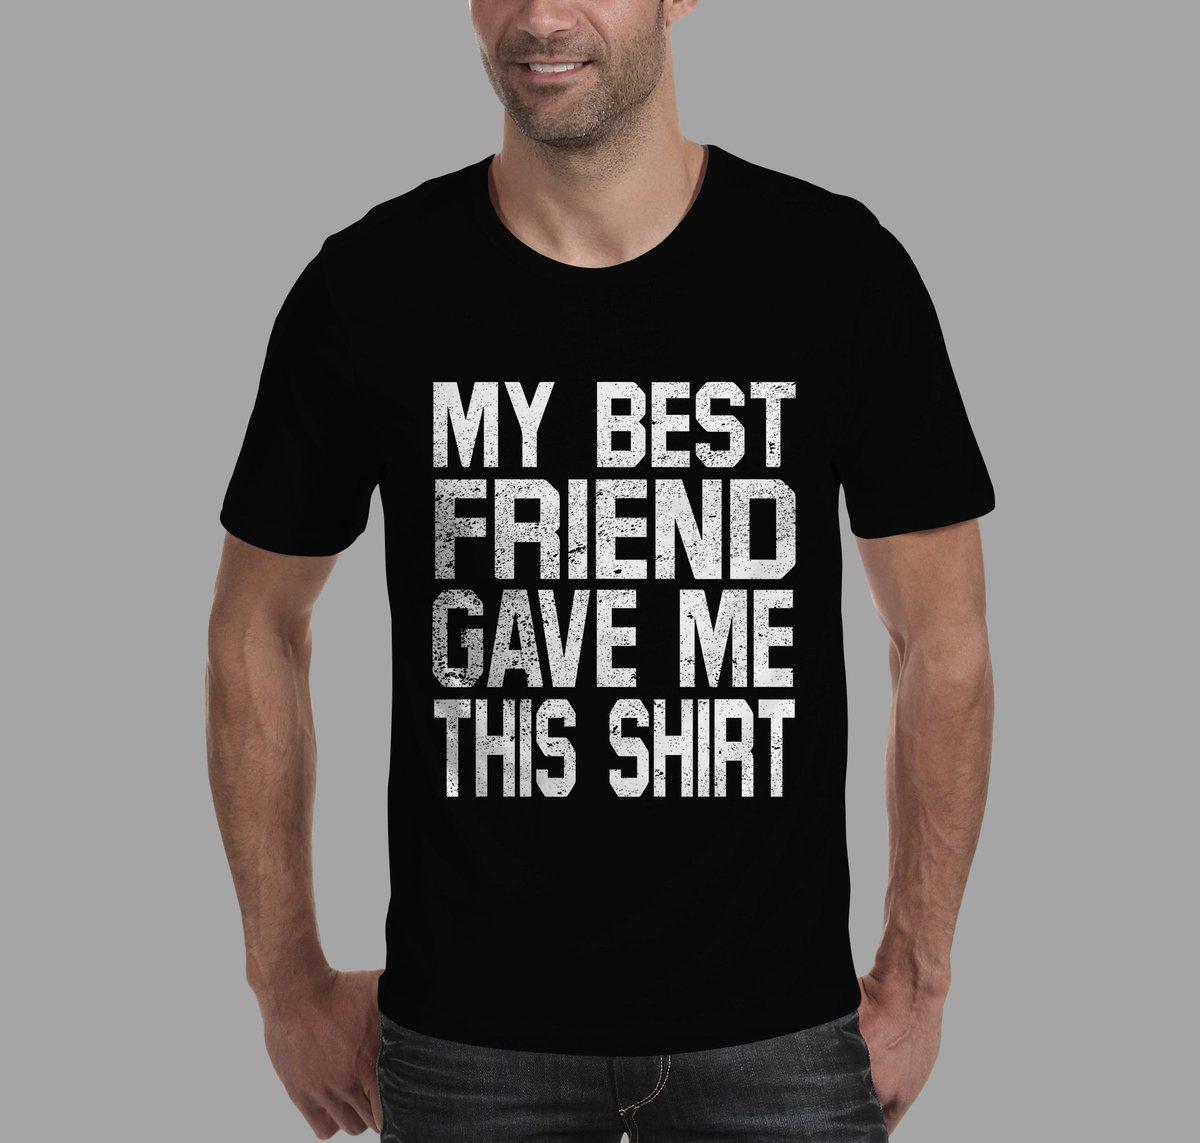 To purchase click a link in a profile.  #bestfriendshirt #bestfriendshirts #designsbestfriend #graphictees #tshirtprint #tshirtstyle  #tshirtsdesign #tshirtonline #tshirtlovers #graphicdesign #tshirtdesign #customtees #shirtsonline #shirtlovers #shirtsale #shirtstyle #shirtgiftpic.twitter.com/RfJEADRslw